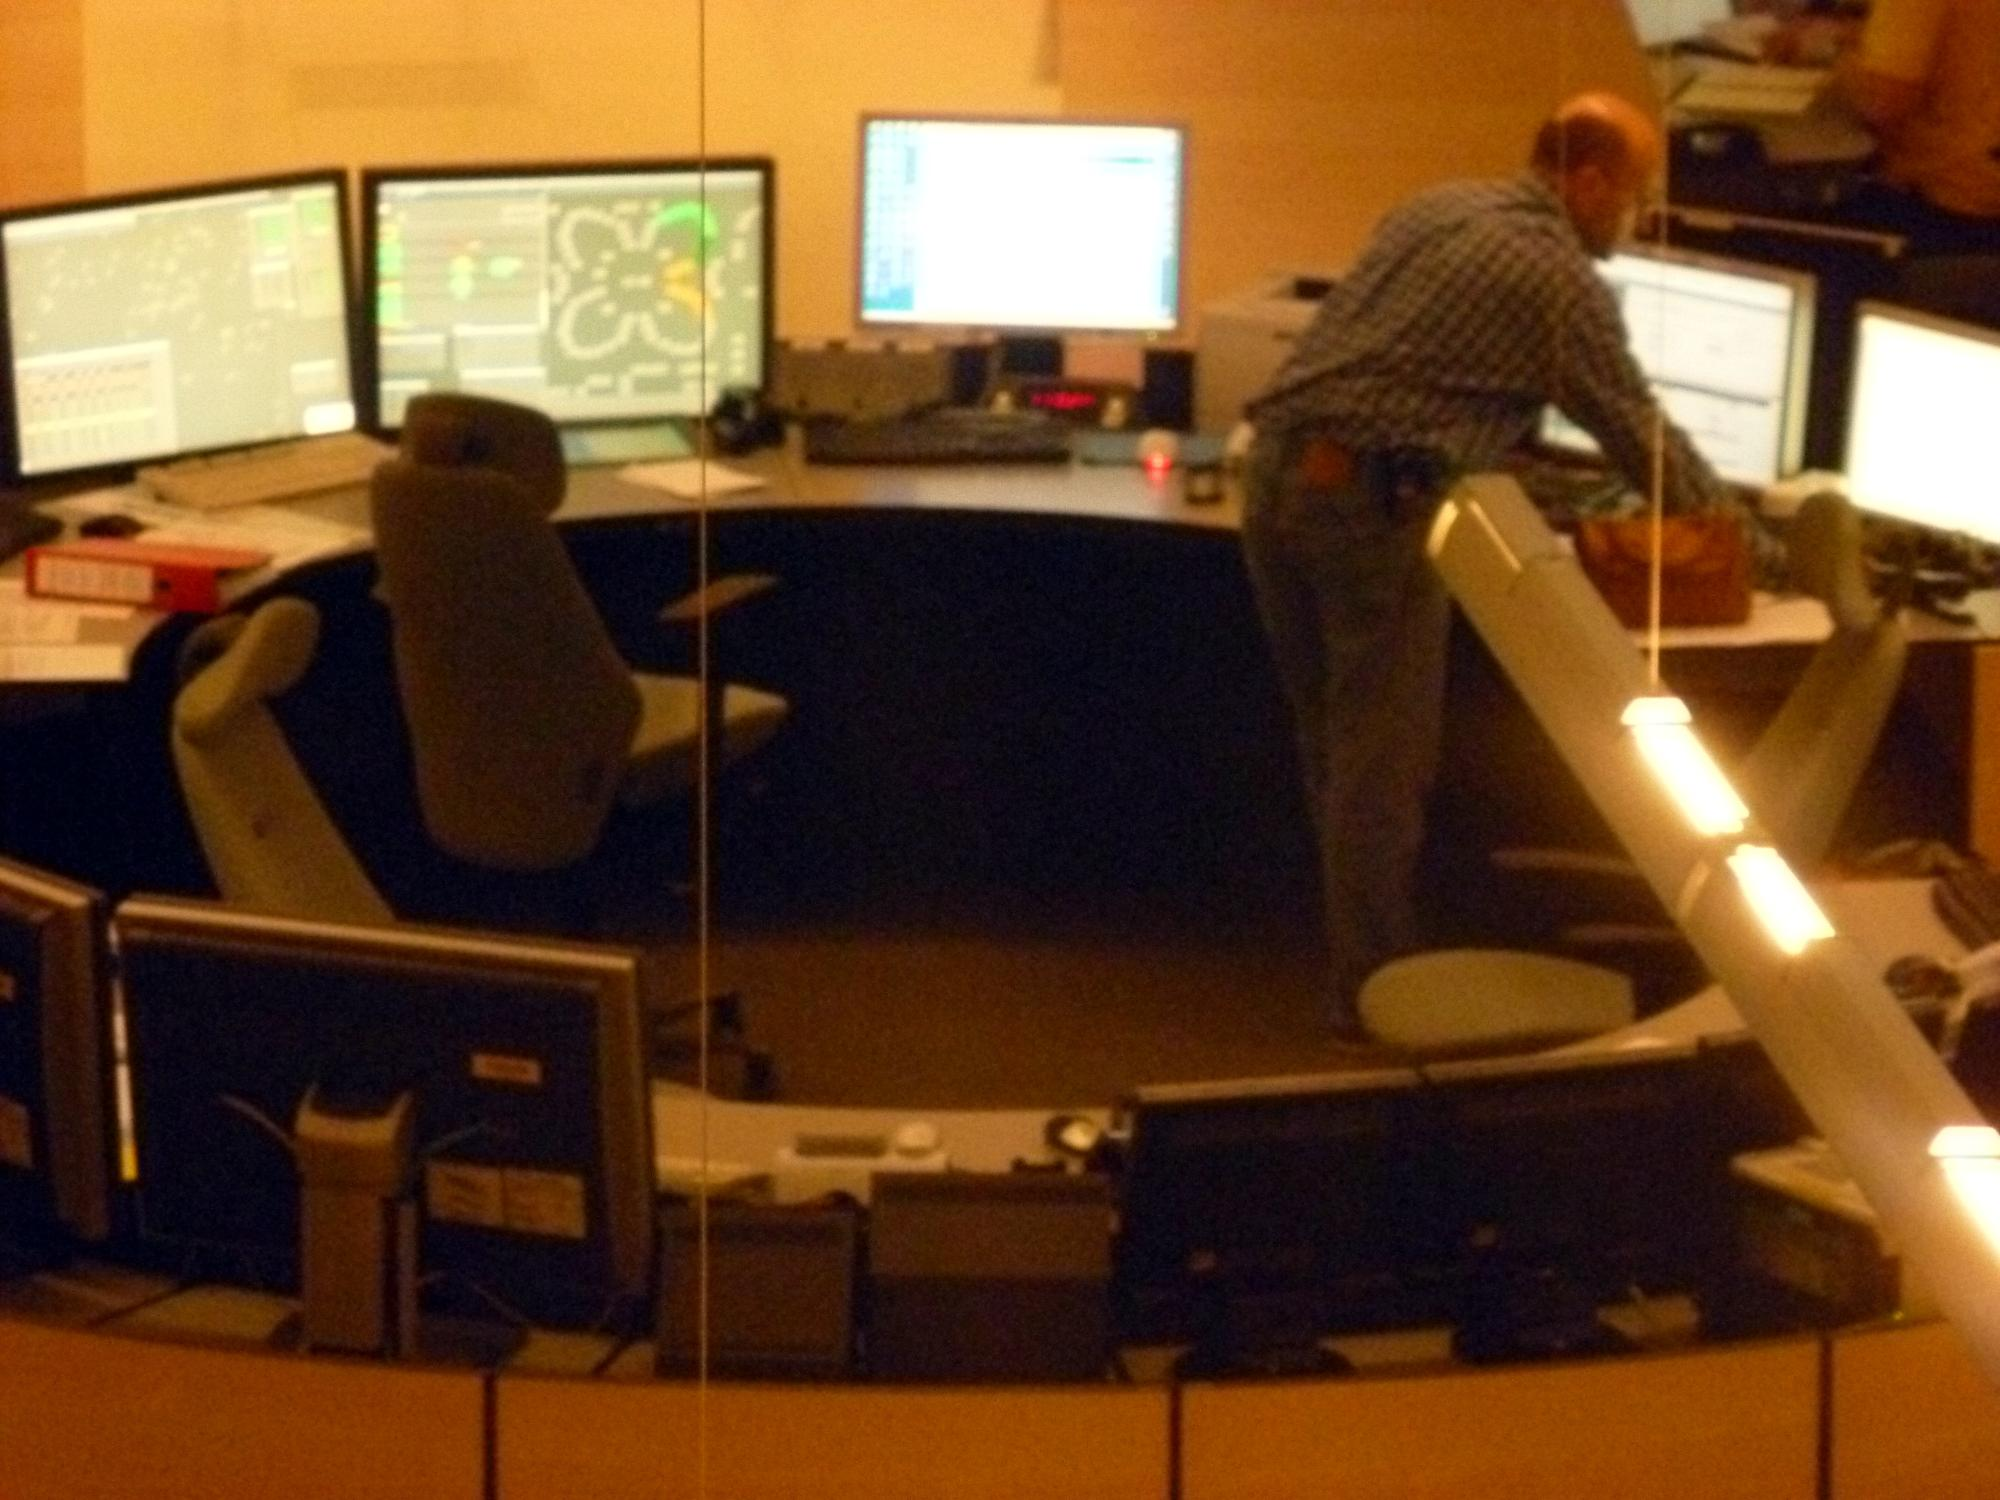 Gallery casa holiday generalaviation belgian a t c 5 for Interior zaventem